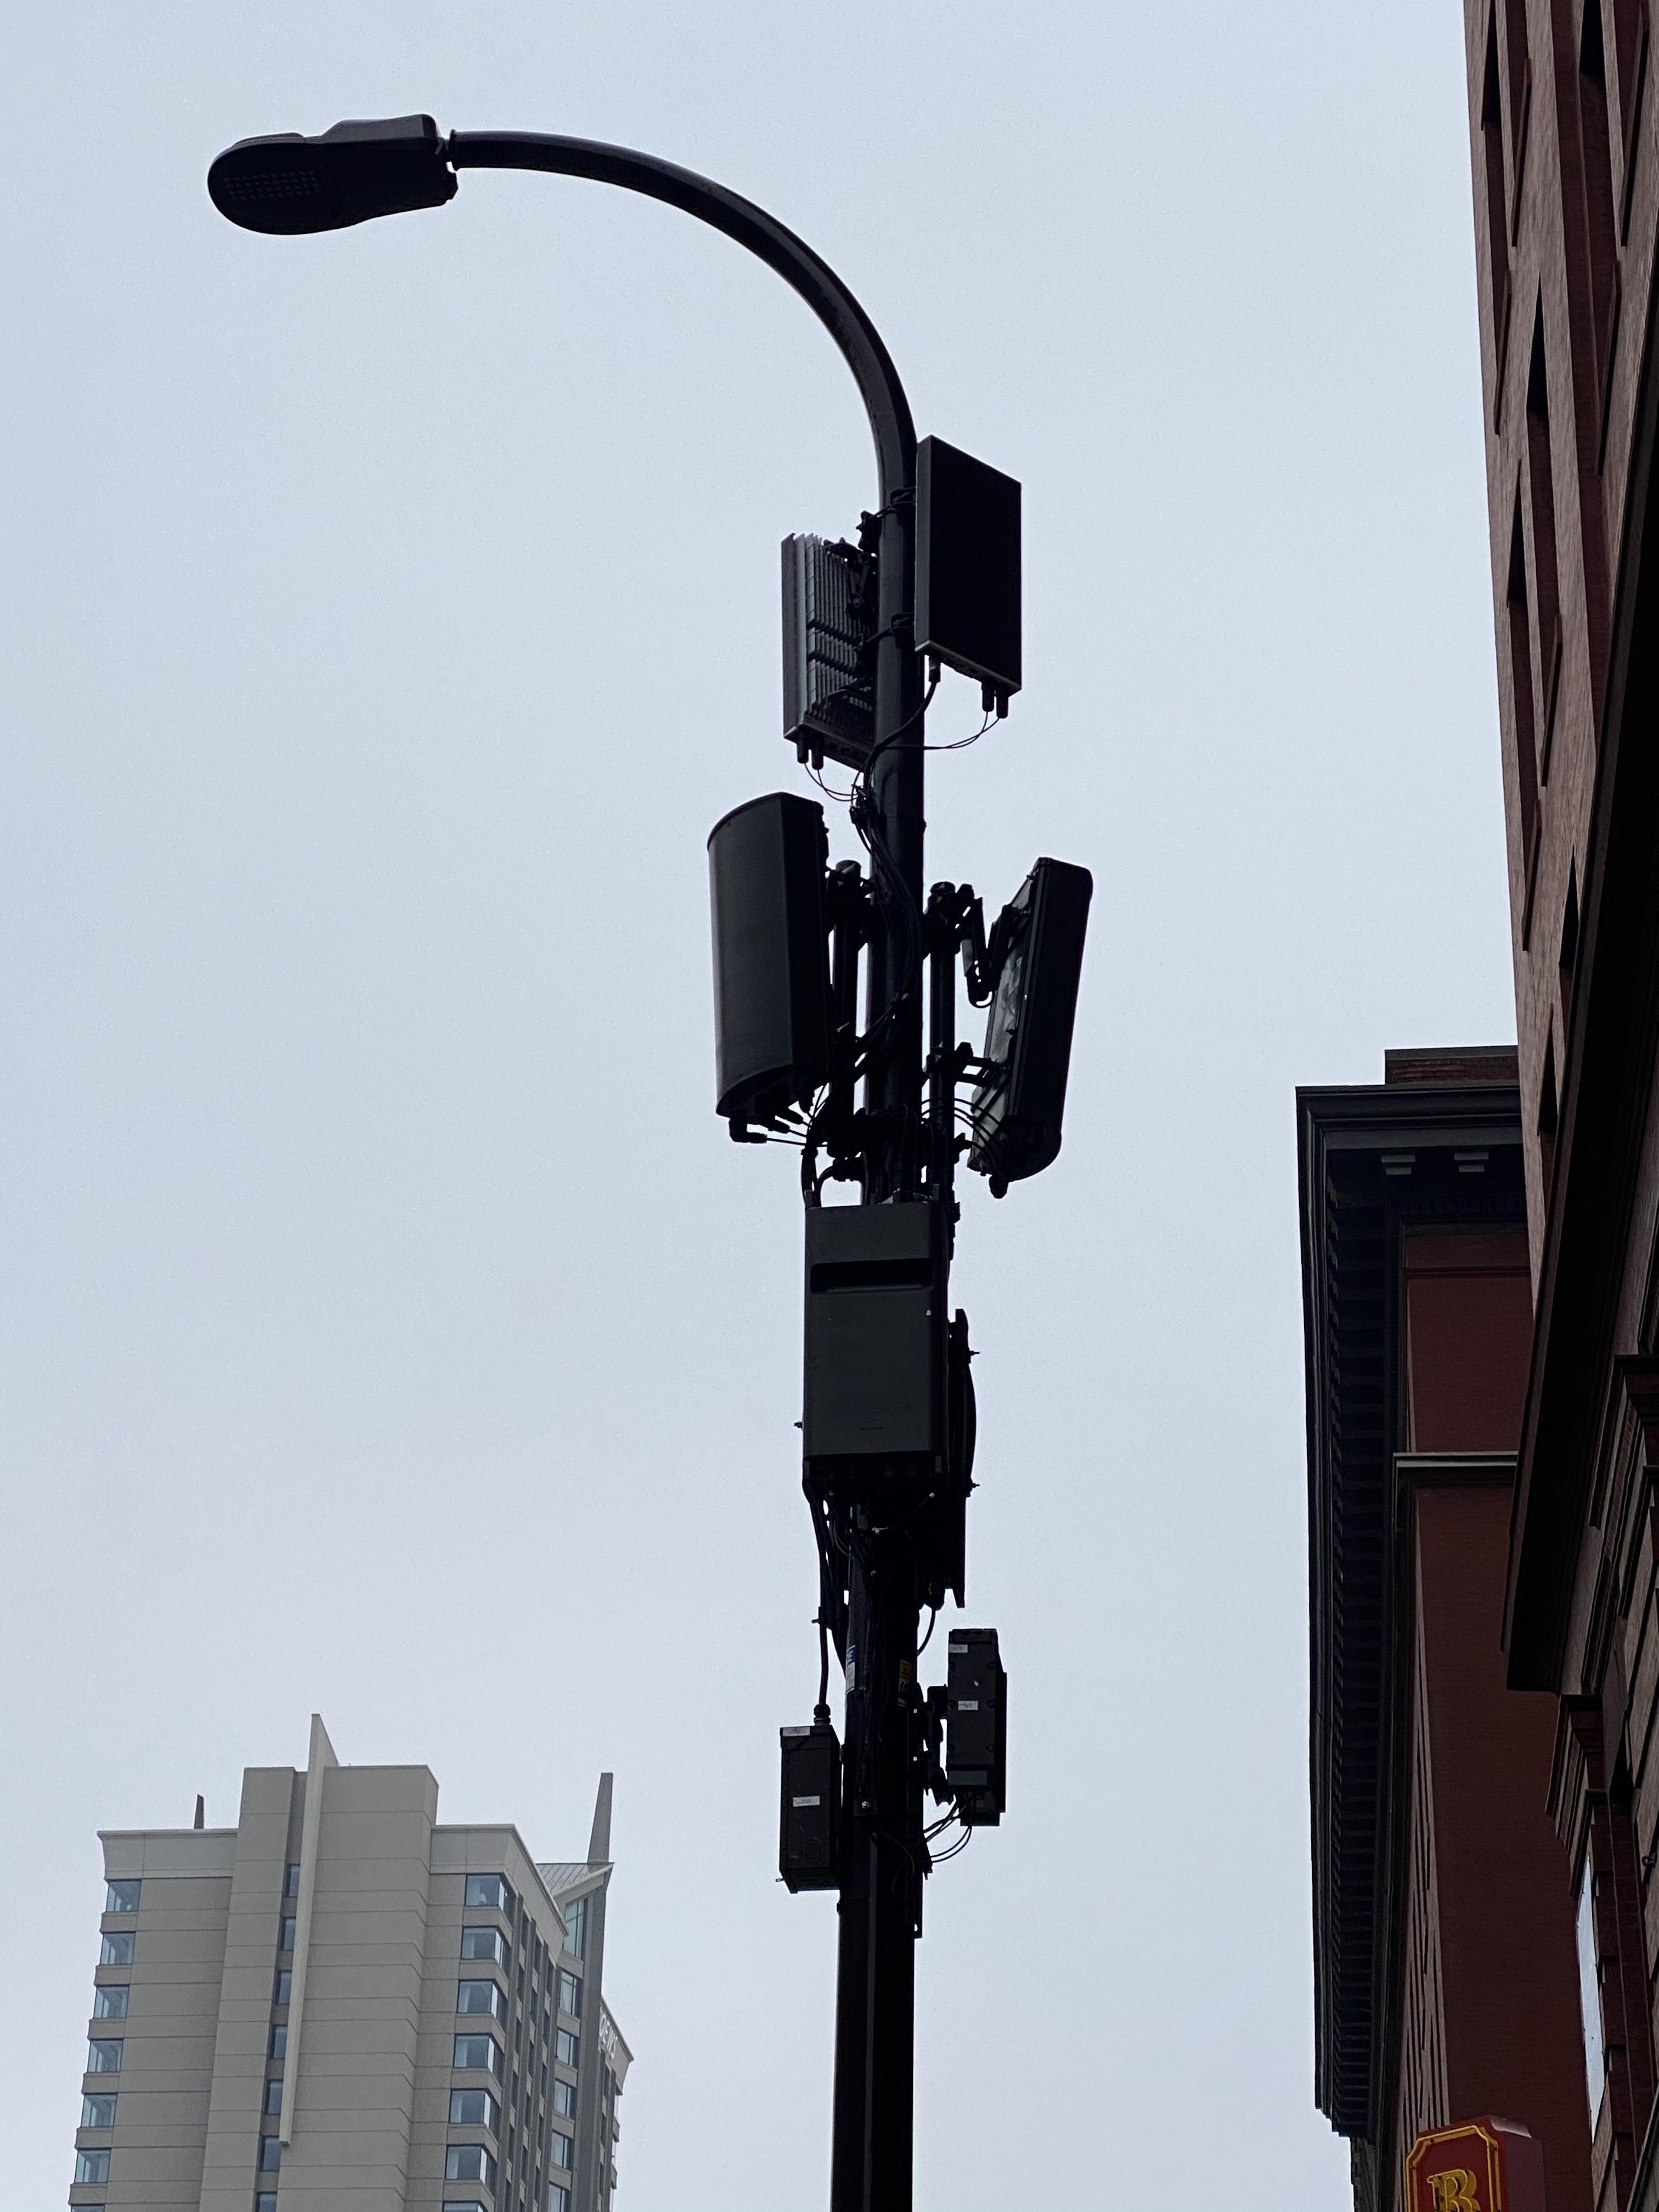 Gunfire Sensors Mounted On Light Pole